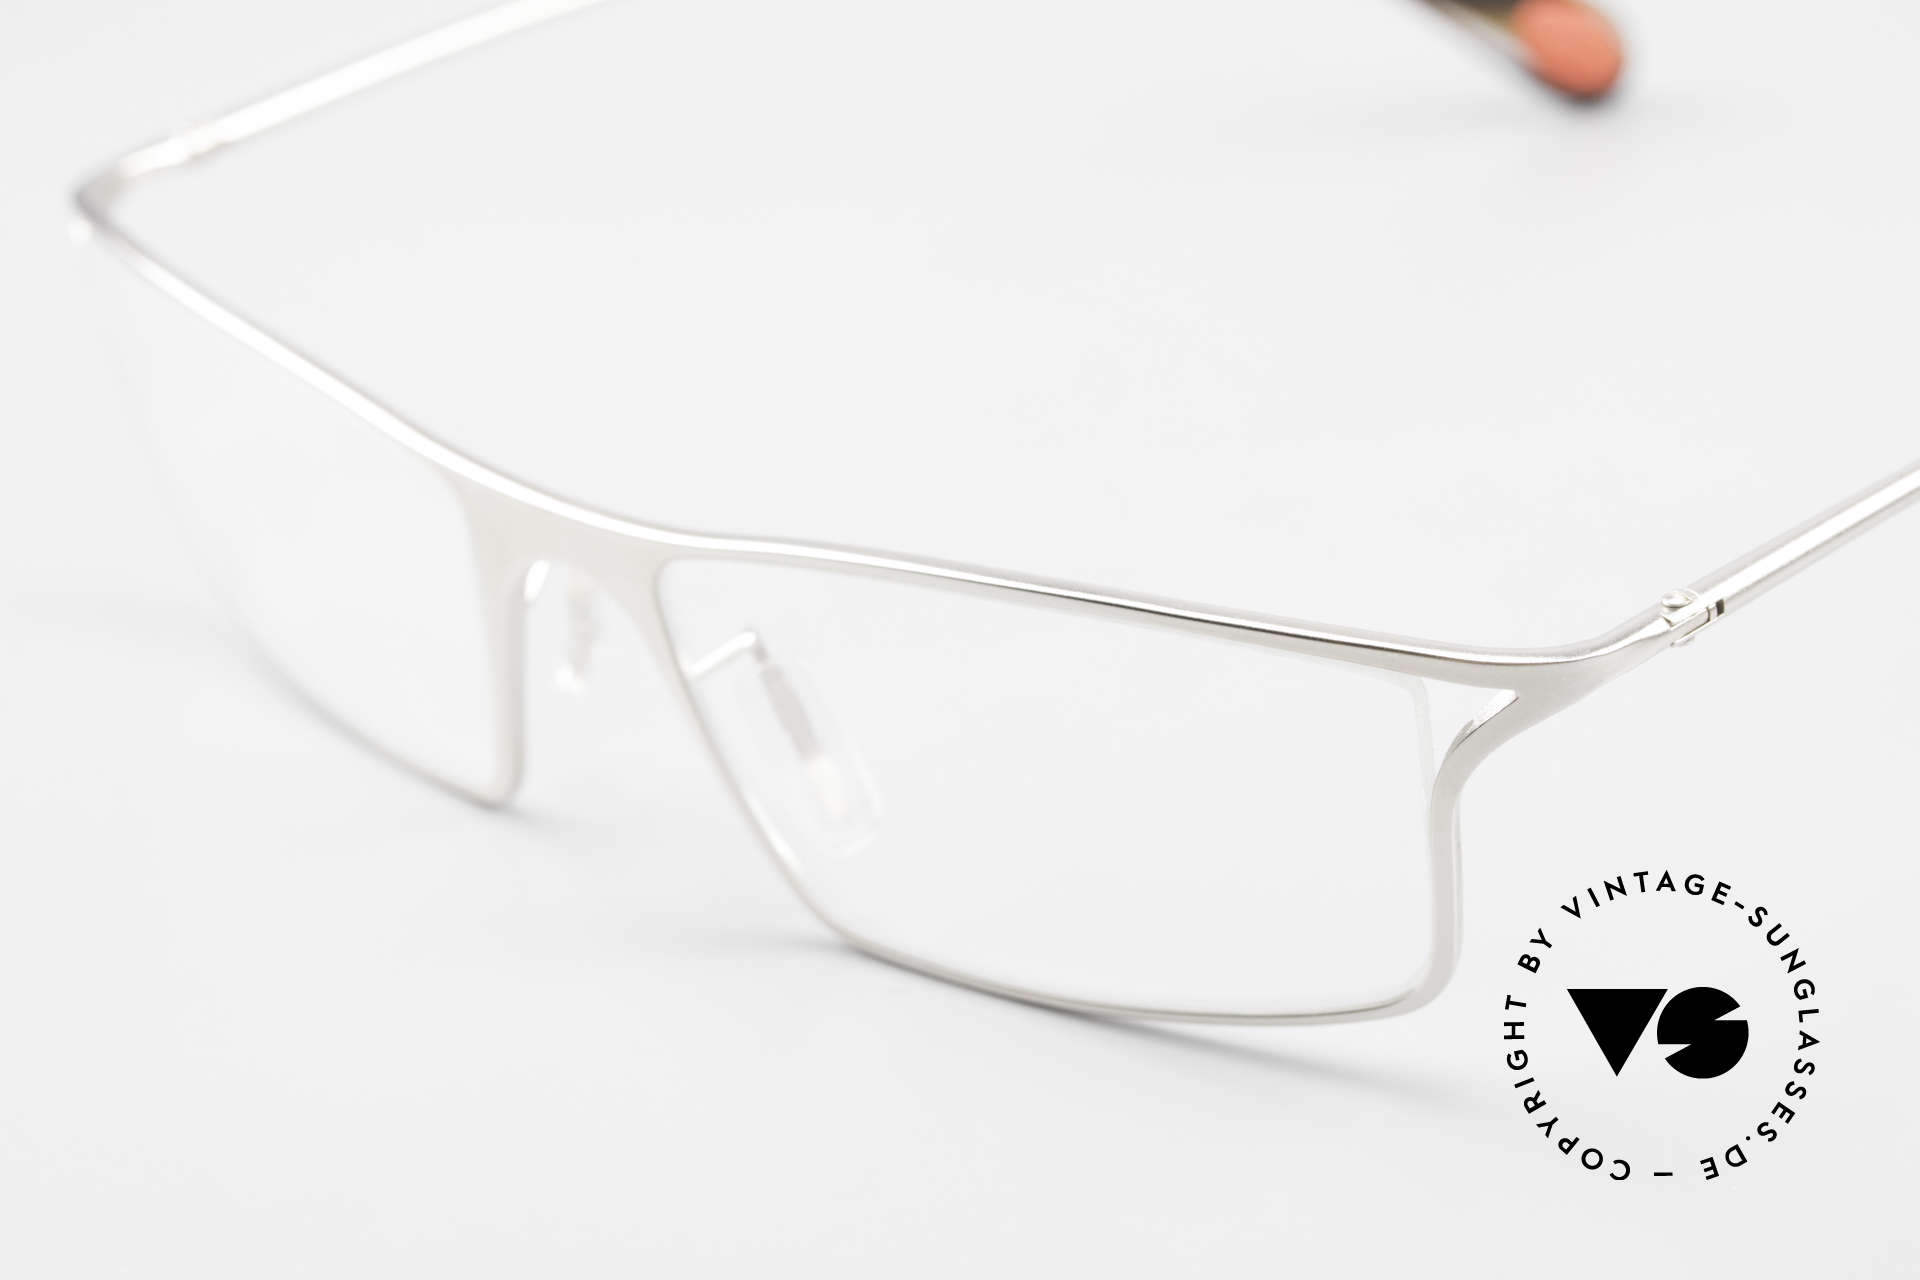 Bugatti 353 Odotype Vintage Luxury Eyeglass Frame, distinctive style and high-end craftsmanship, Made for Men